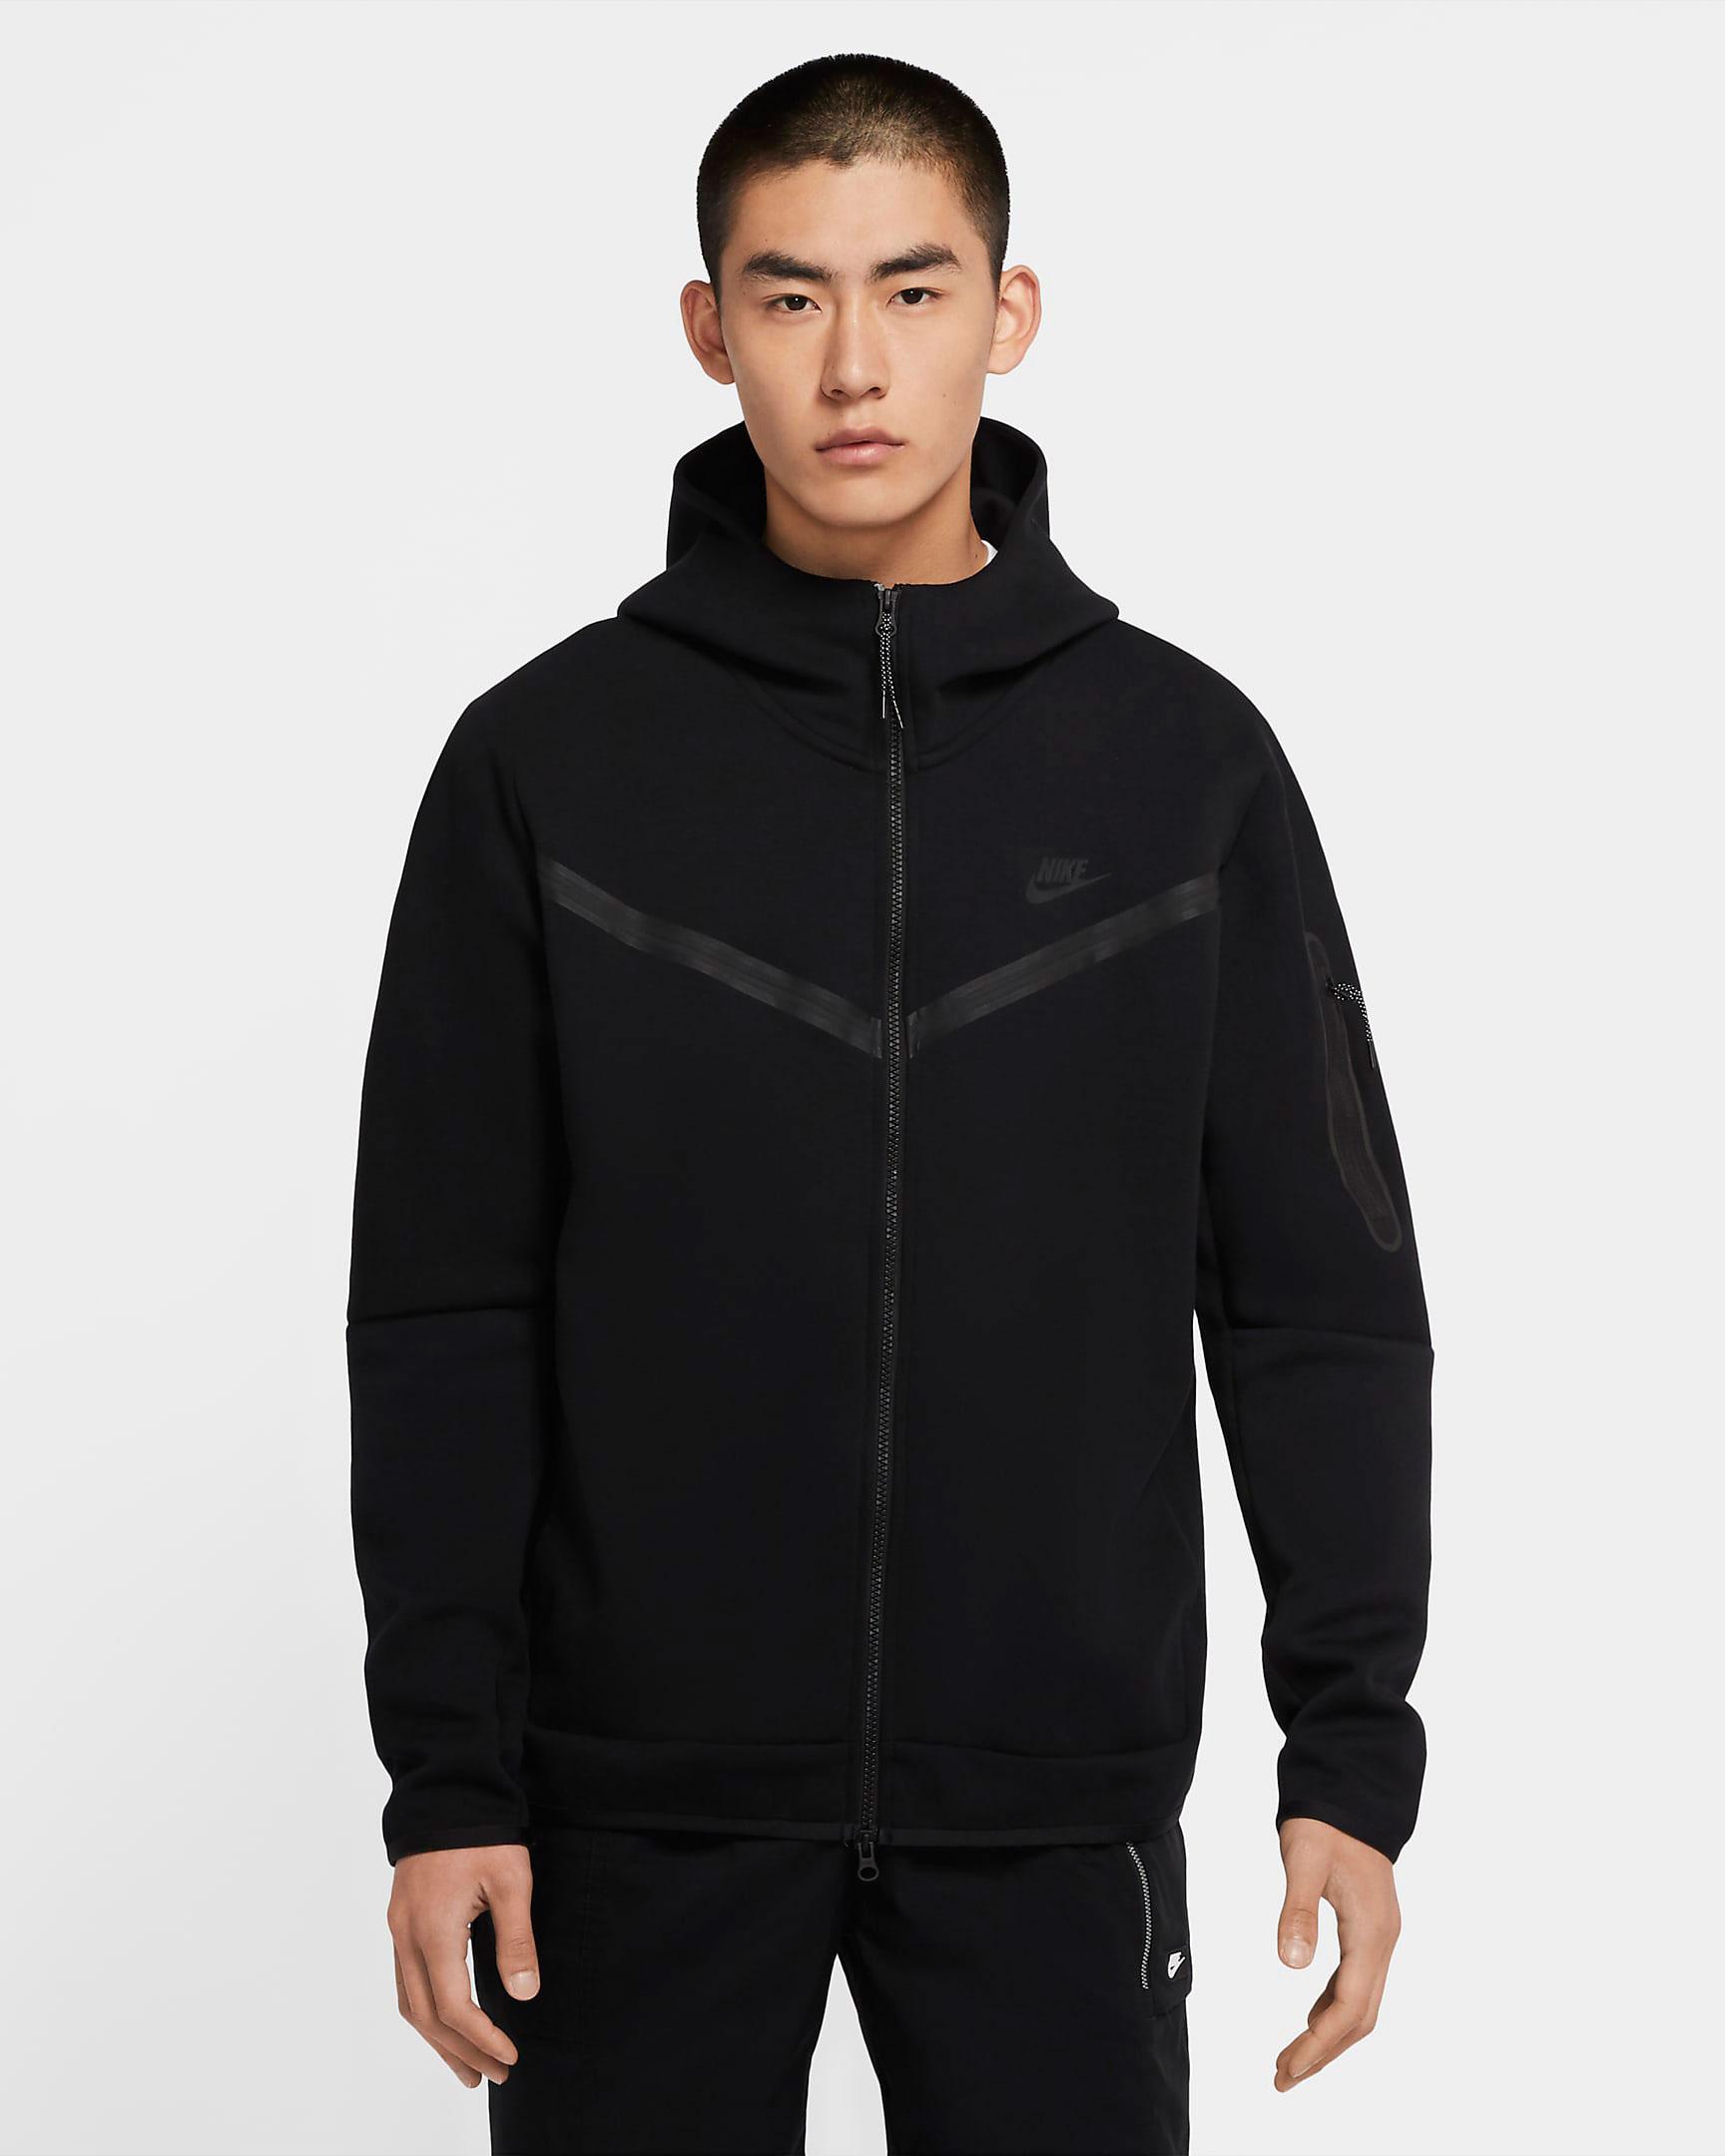 nike-tech-fleece-black-hoodie